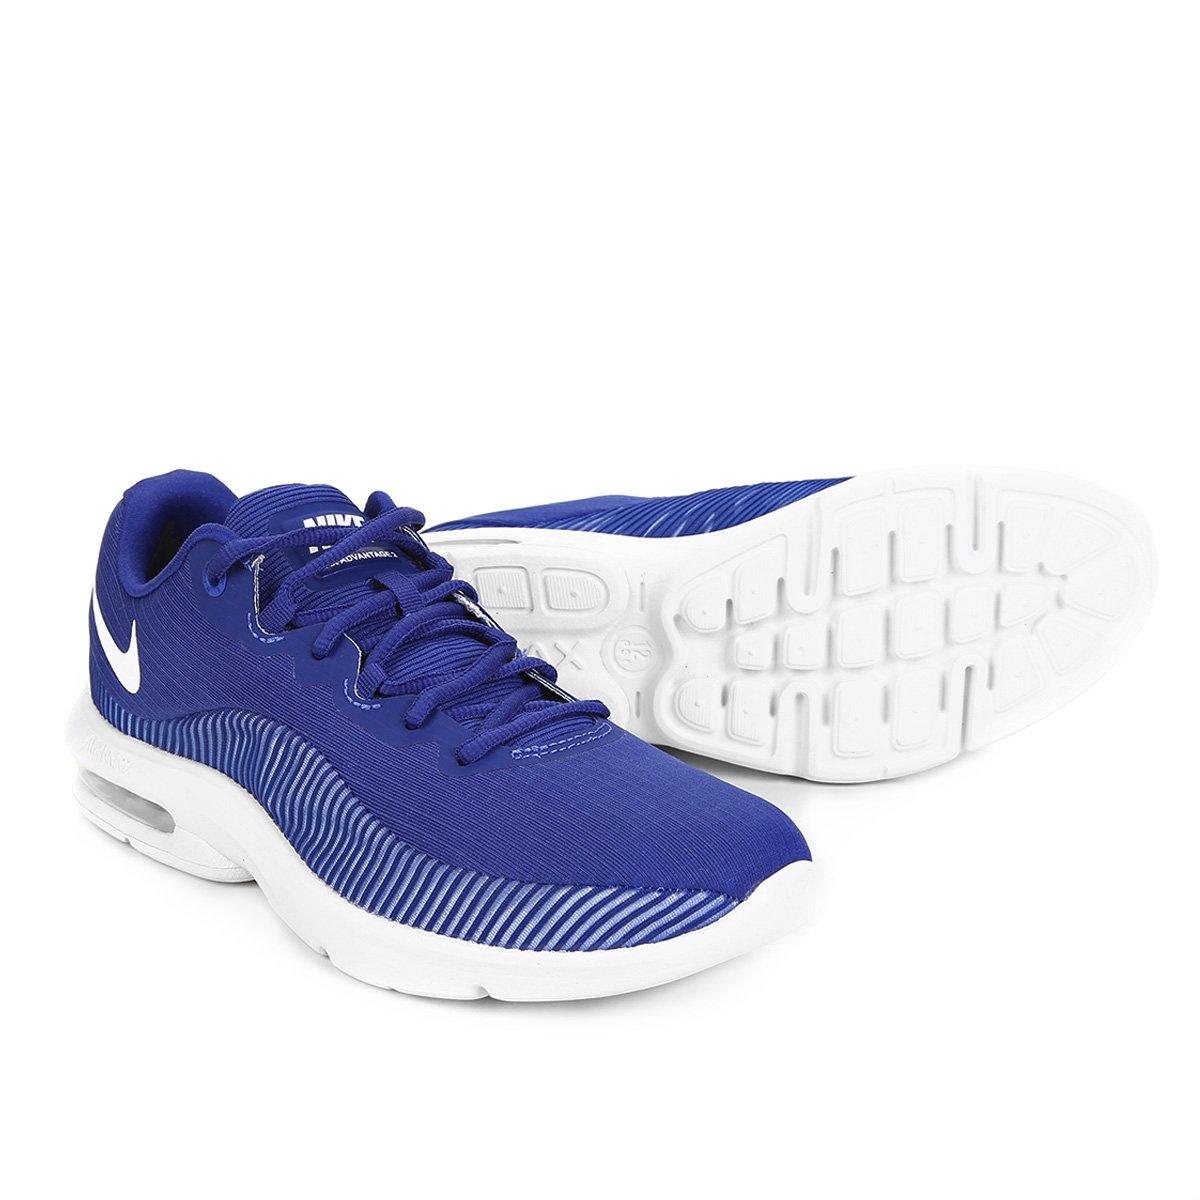 Tênis Nike Air Max Advantage 2 Masculino Azul e Branco